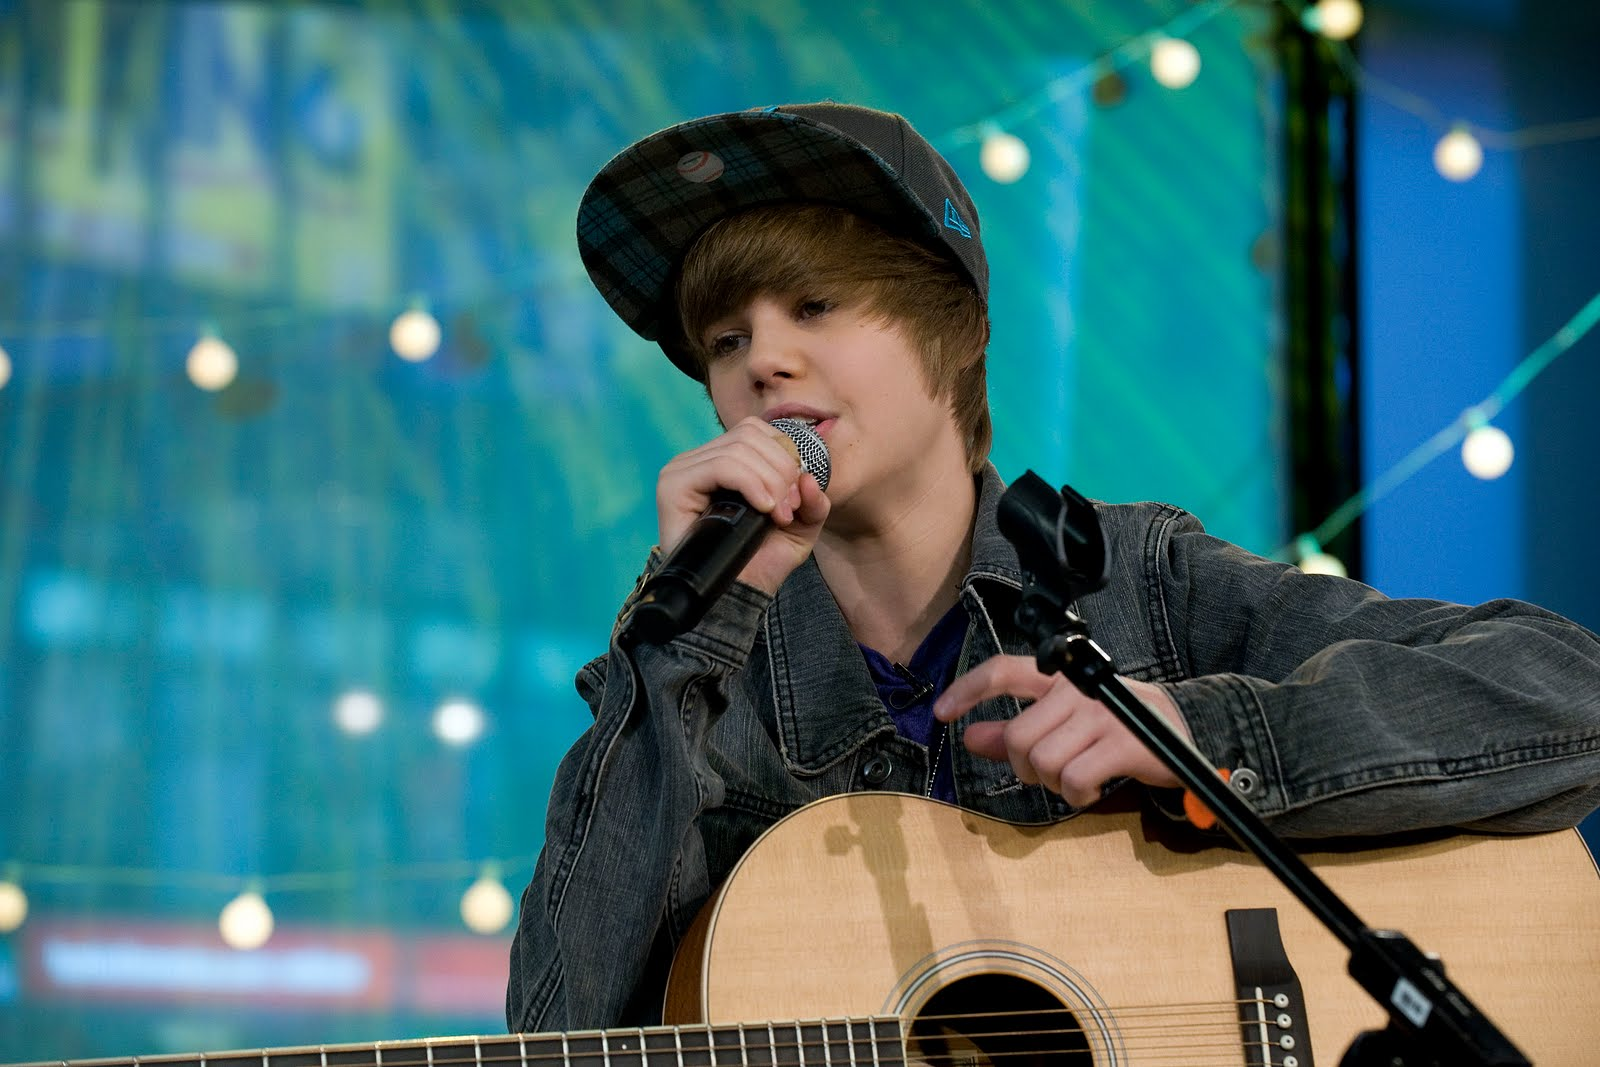 http://4.bp.blogspot.com/-sAaNLMZaI8U/TyKaLCksk4I/AAAAAAAABZw/TFR3voDTX6c/s1600/Justin-Bieber-Concert.jpg